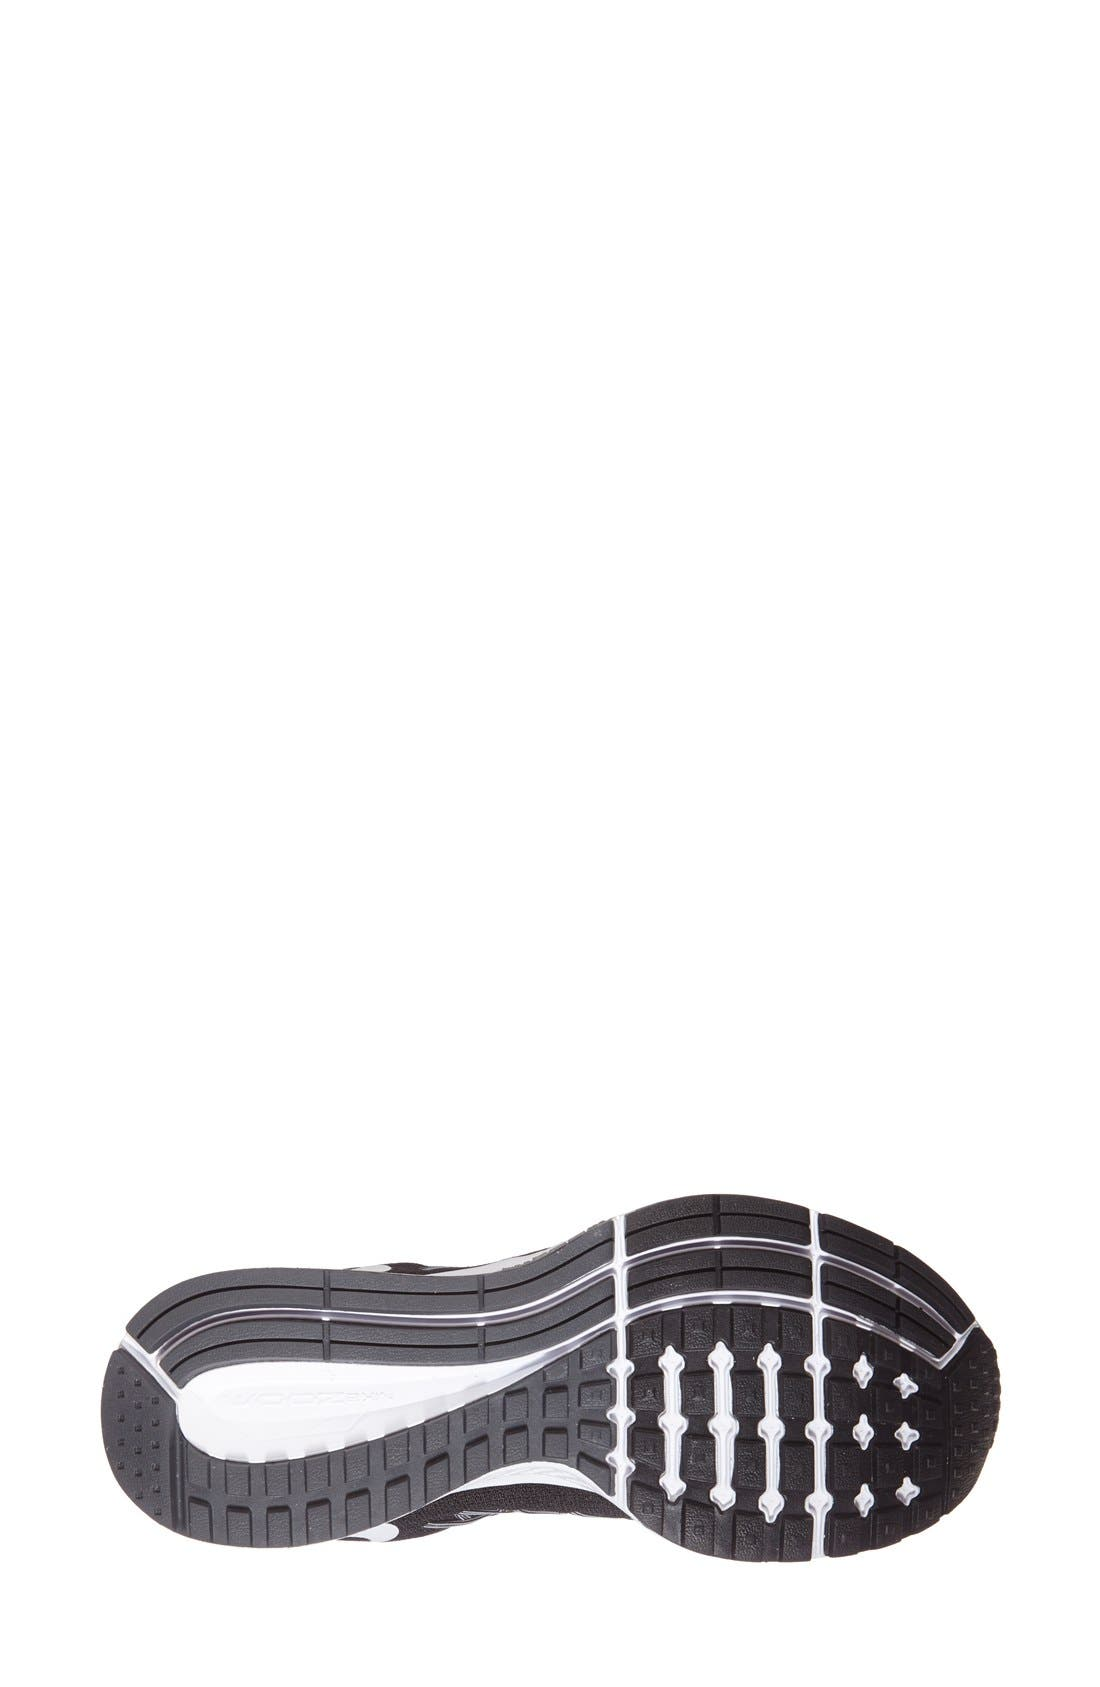 'Zoom Pegasus 32' Running Shoe,                             Alternate thumbnail 4, color,                             Black/ White/ Pure Platinum